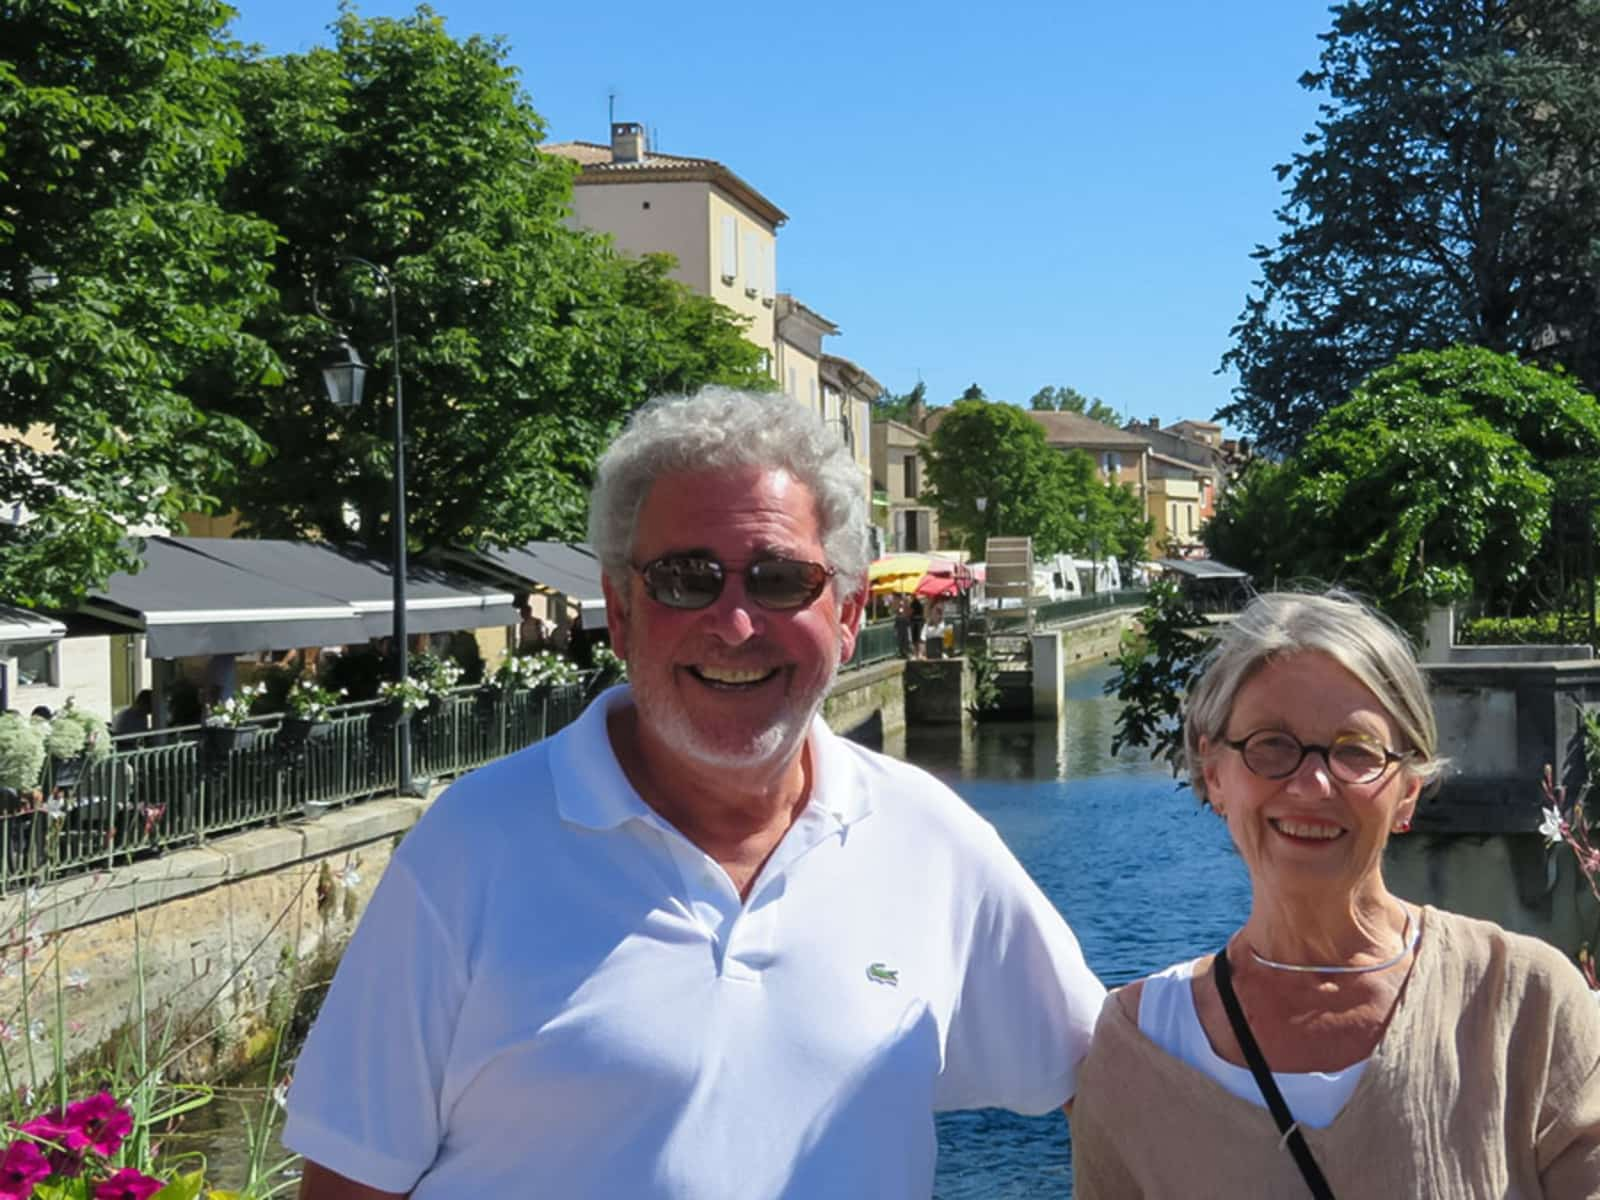 Diana & Marty from Saint Helena, California, United States